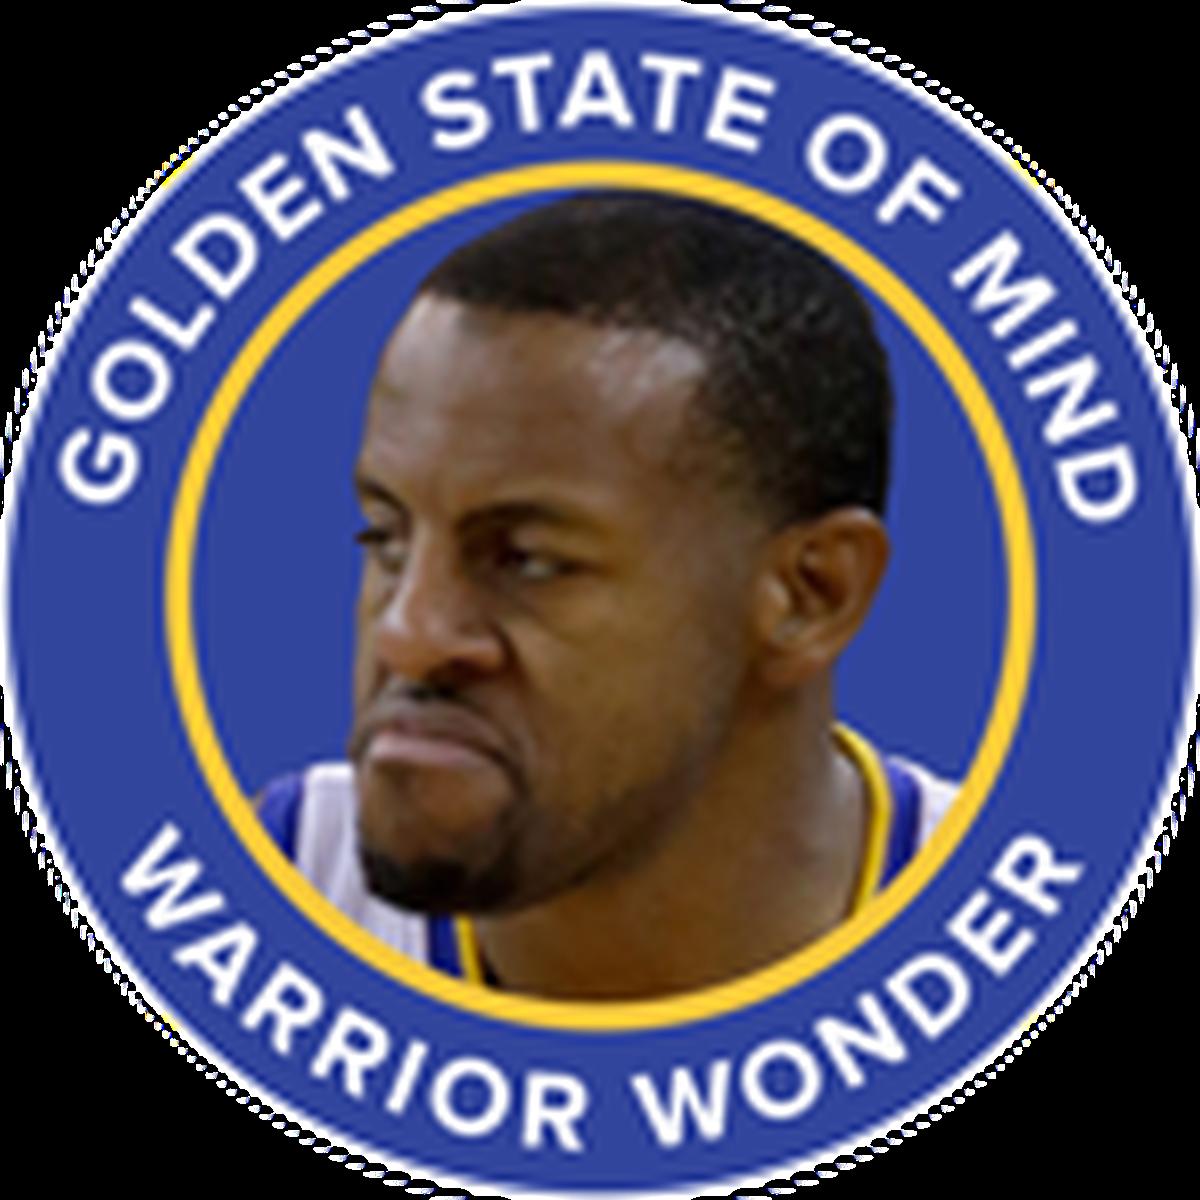 Warriors Vs. Nets Analysis: Andrew Bogut, Andre Iguodala